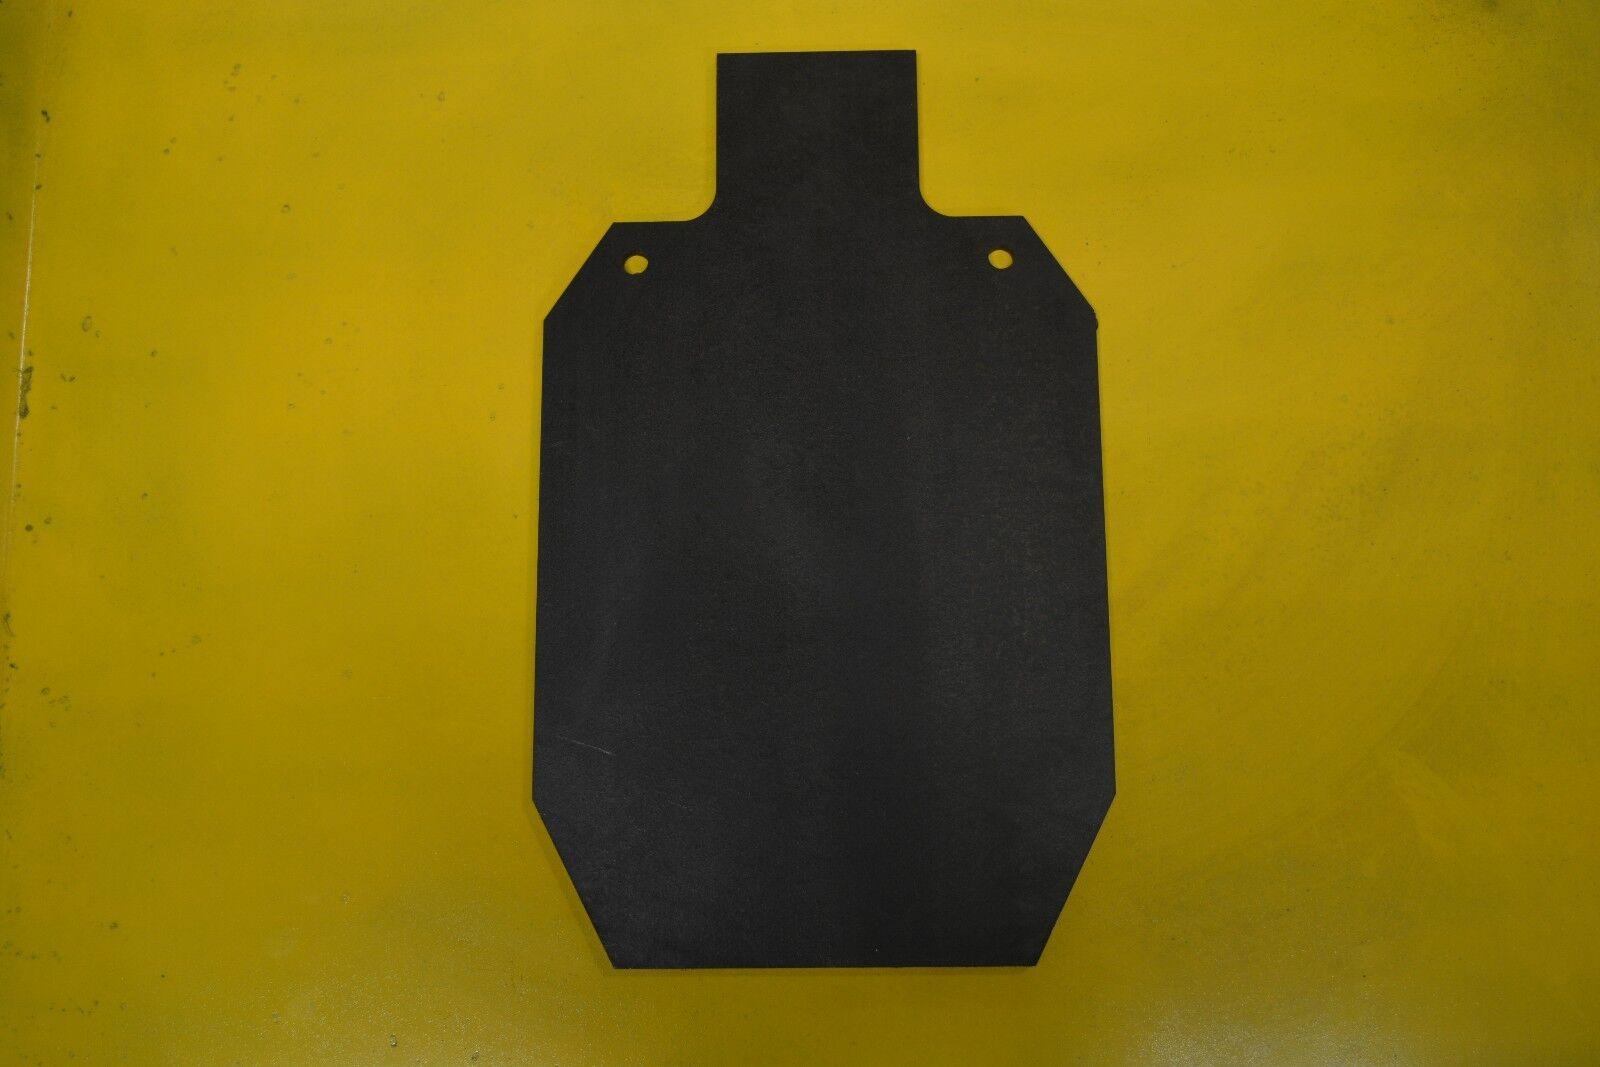 AR500 steel IDPA / IPSC 2/3 shooting target  1/2